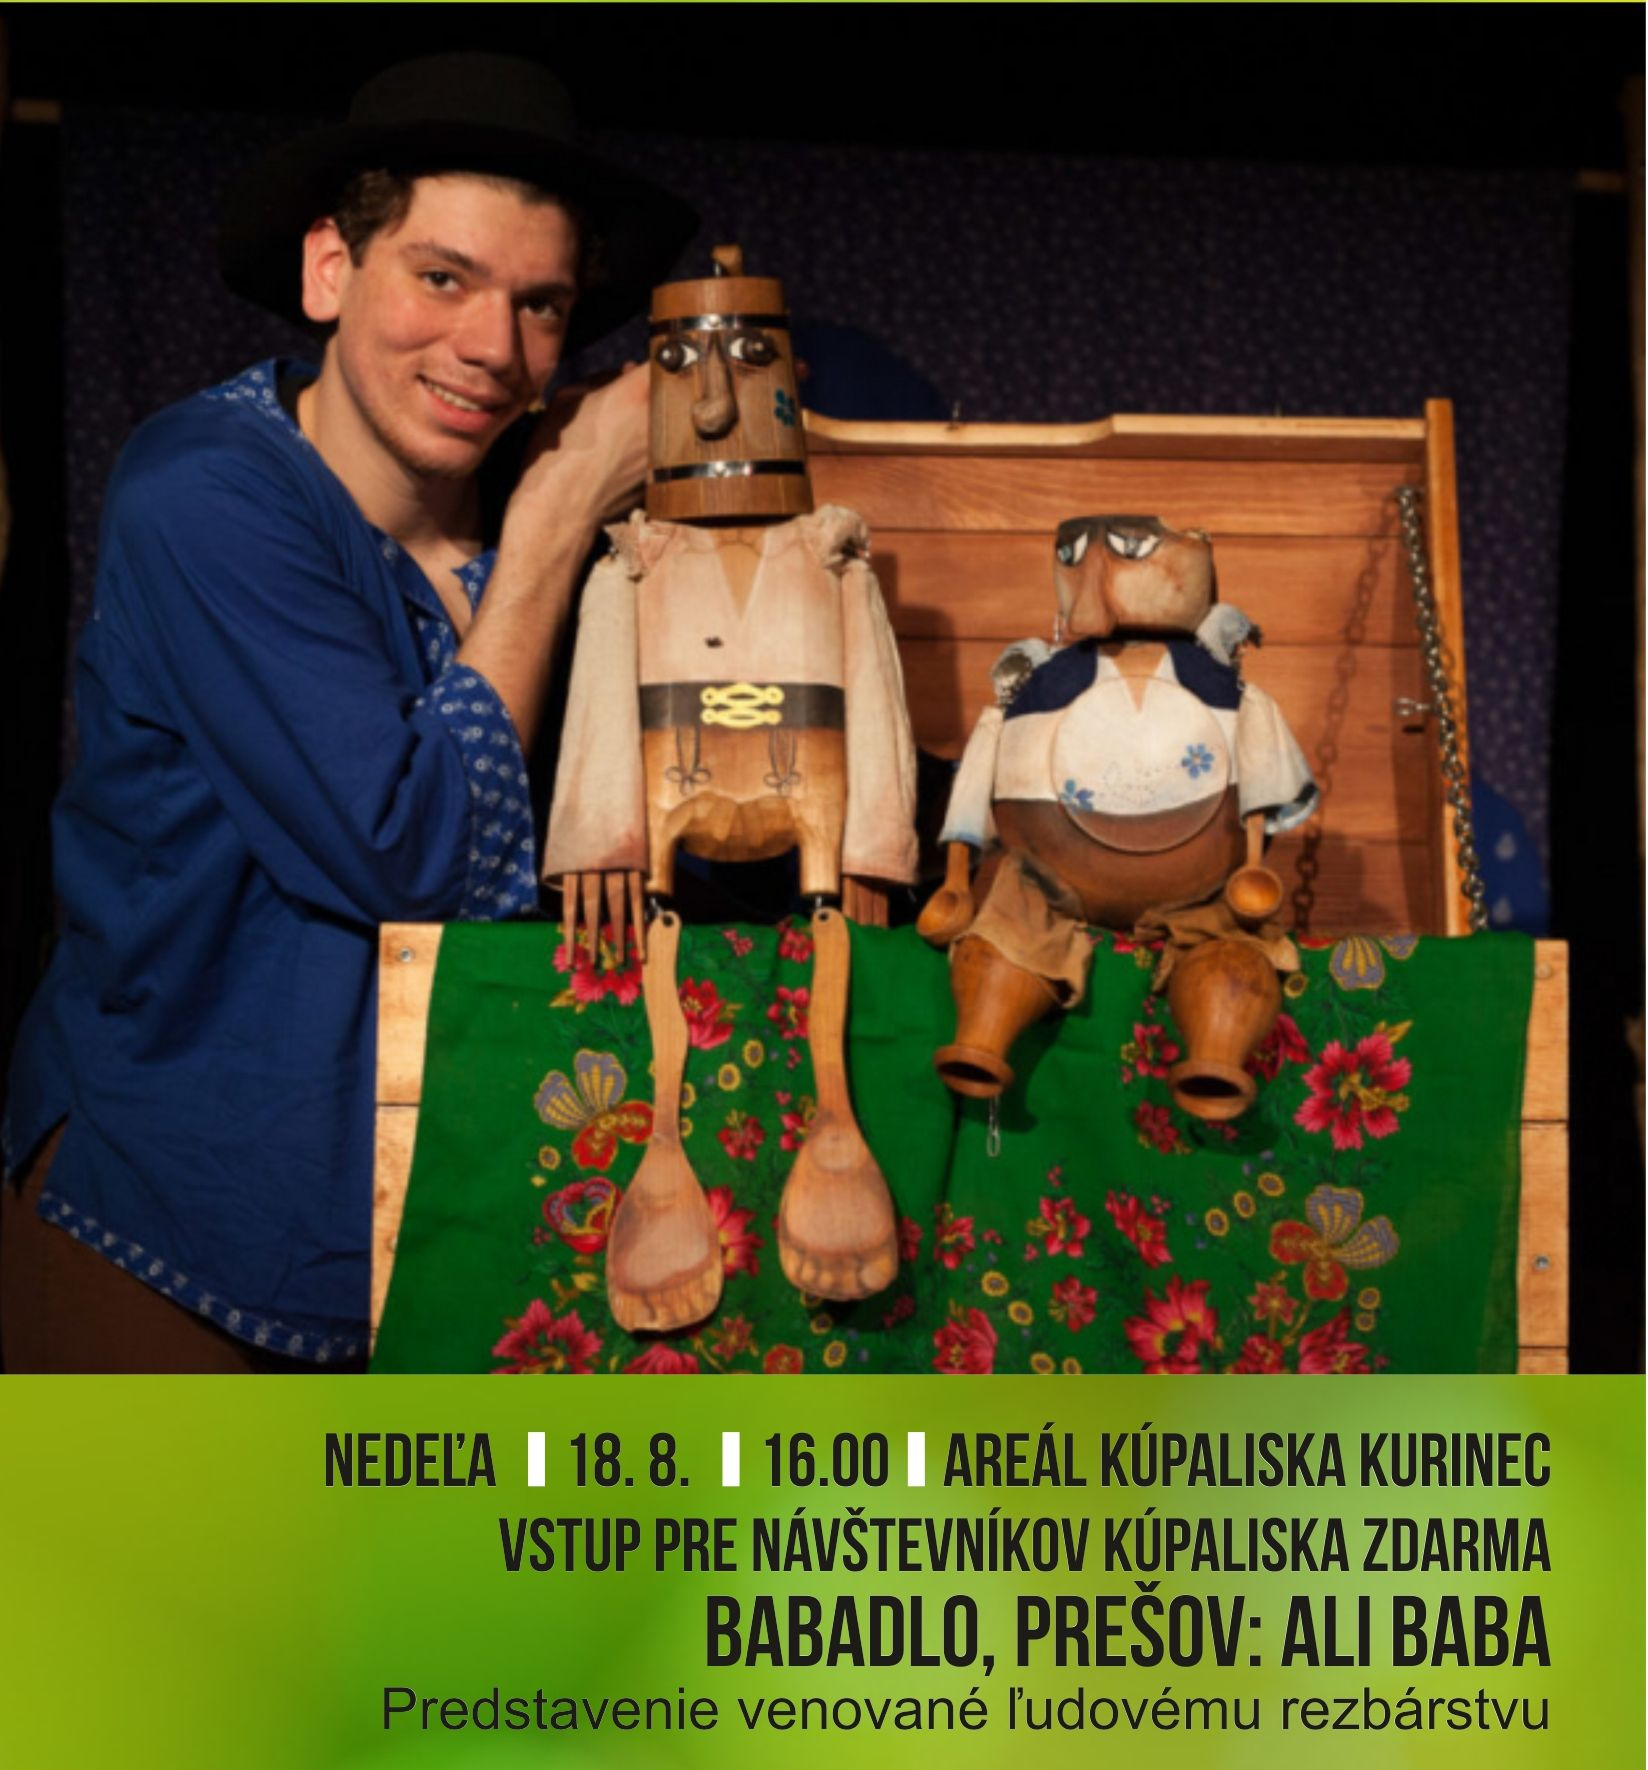 Divadlo Babadlo: Ali Baba @ Kurinec - kúpalisko